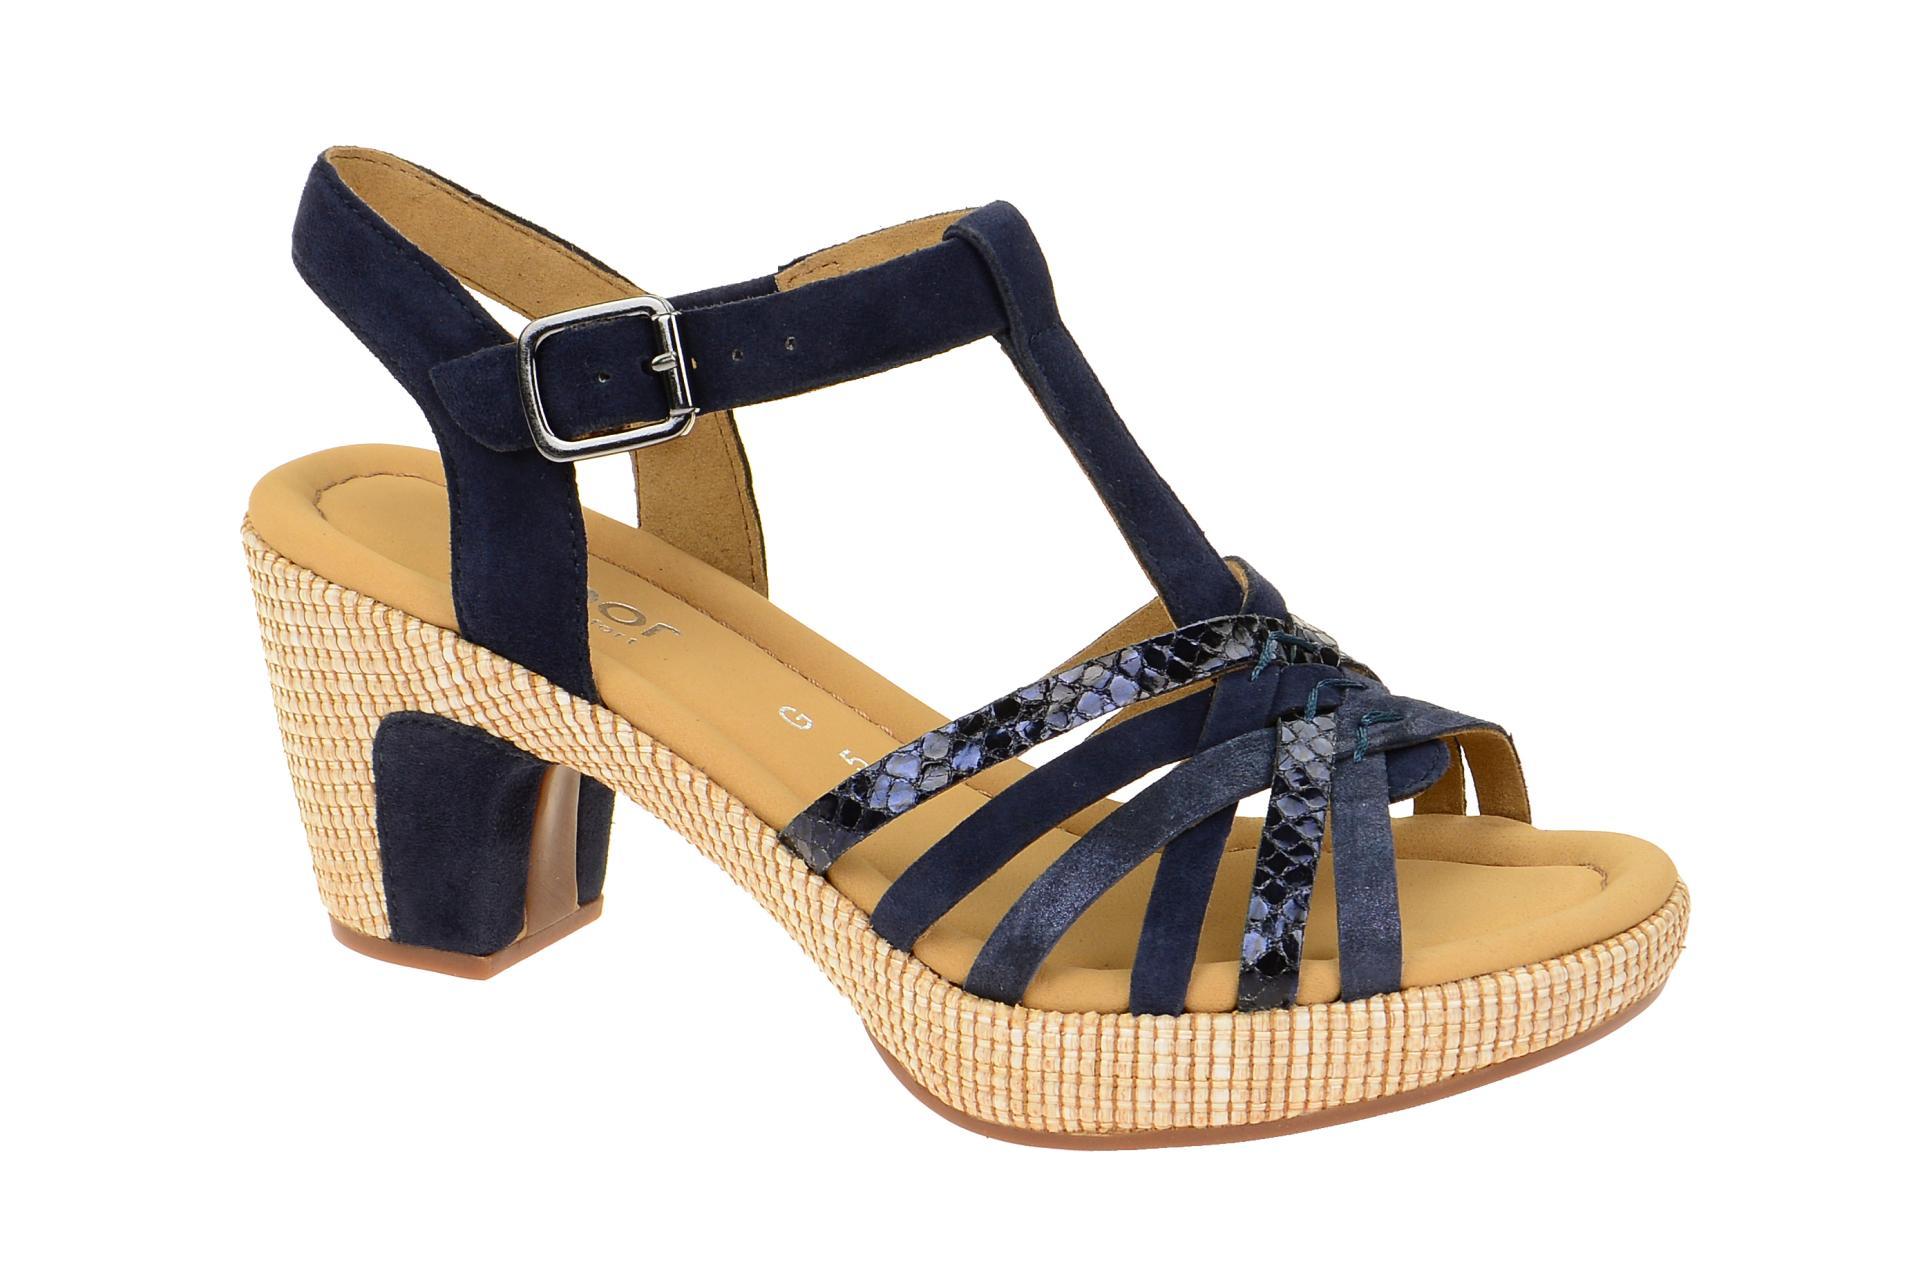 gabor comfort sandalen blau ocean schuhhaus strauch shop. Black Bedroom Furniture Sets. Home Design Ideas